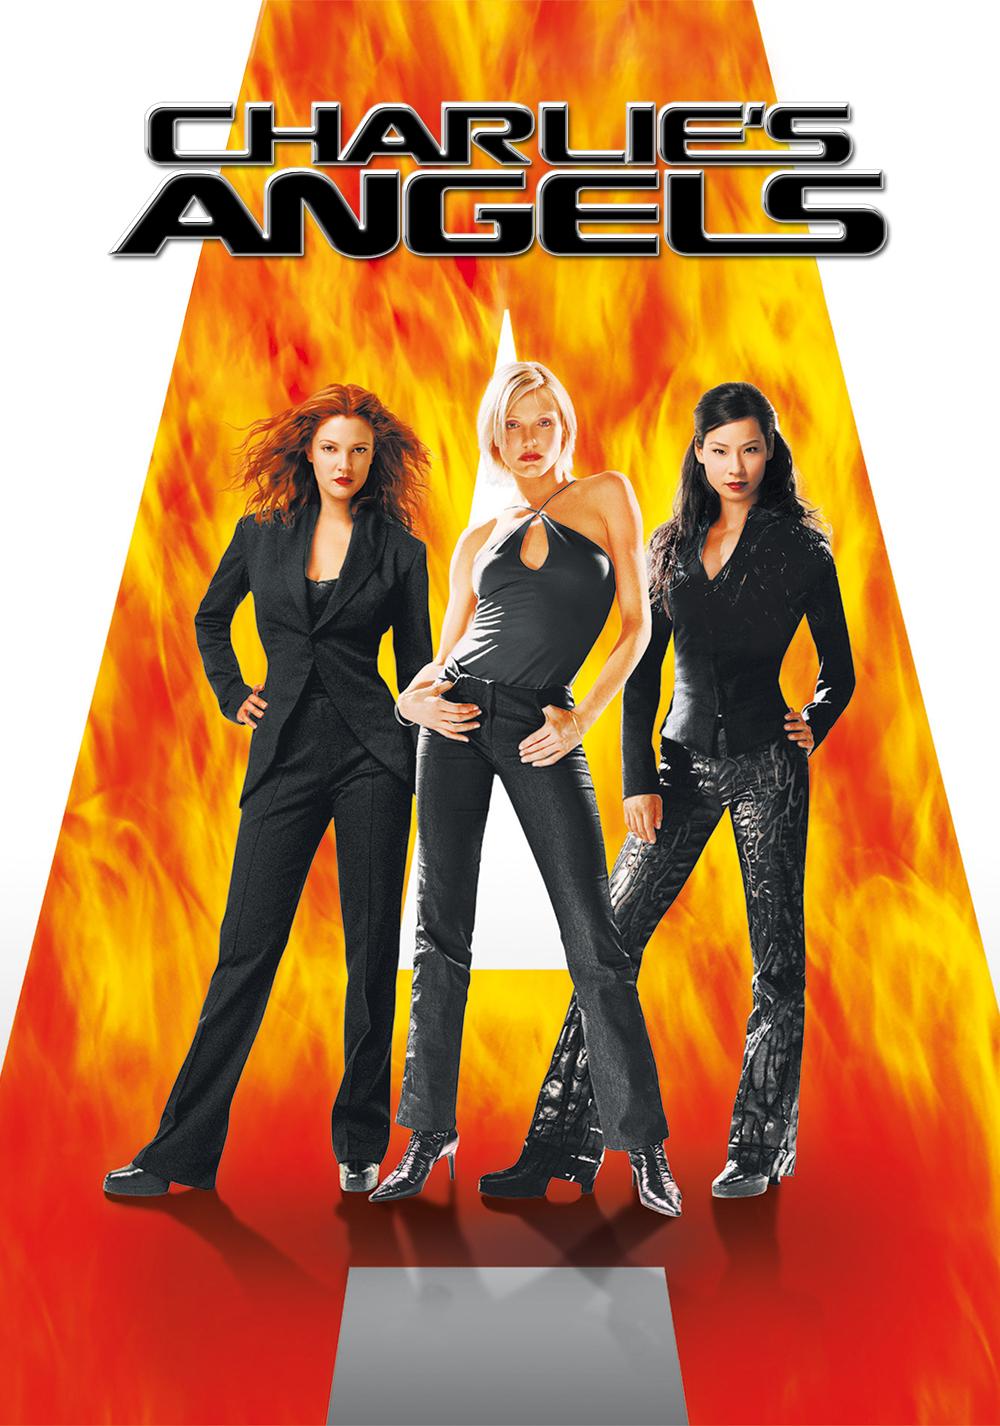 Charlie's Angels | Movie fanart | fanart.tv Charlies Angels 2000